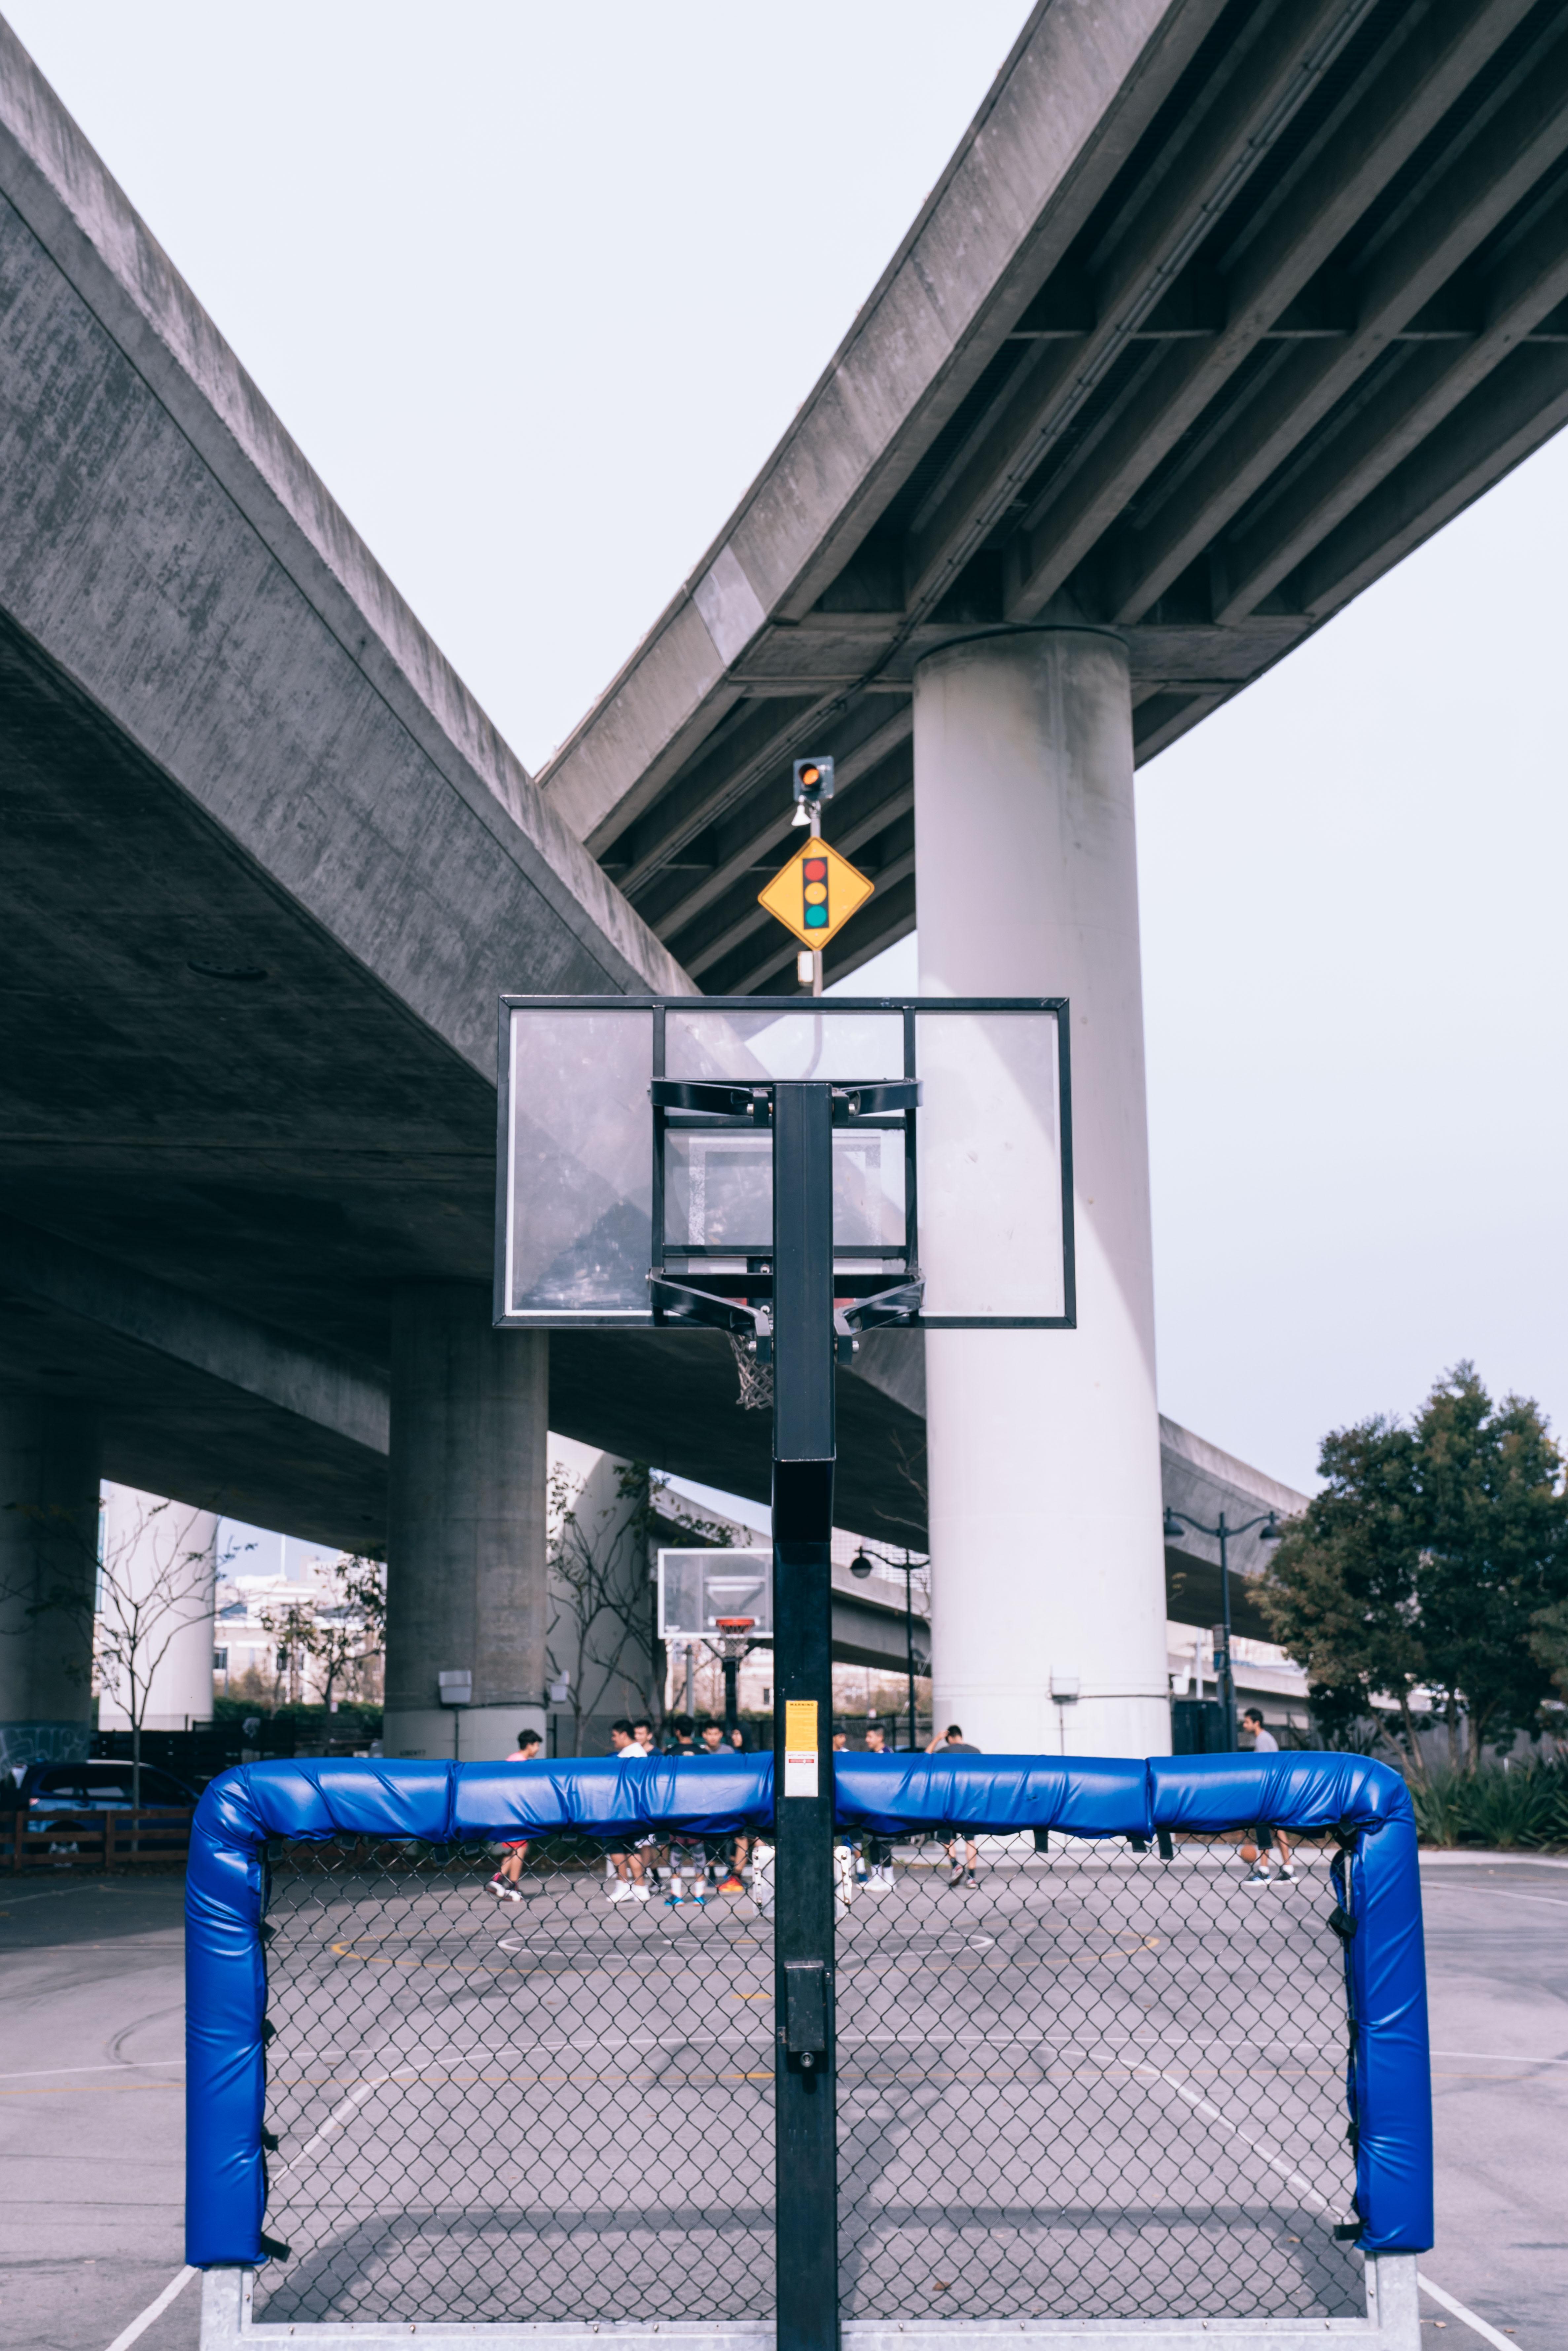 photo of soccer goalie below basketball system